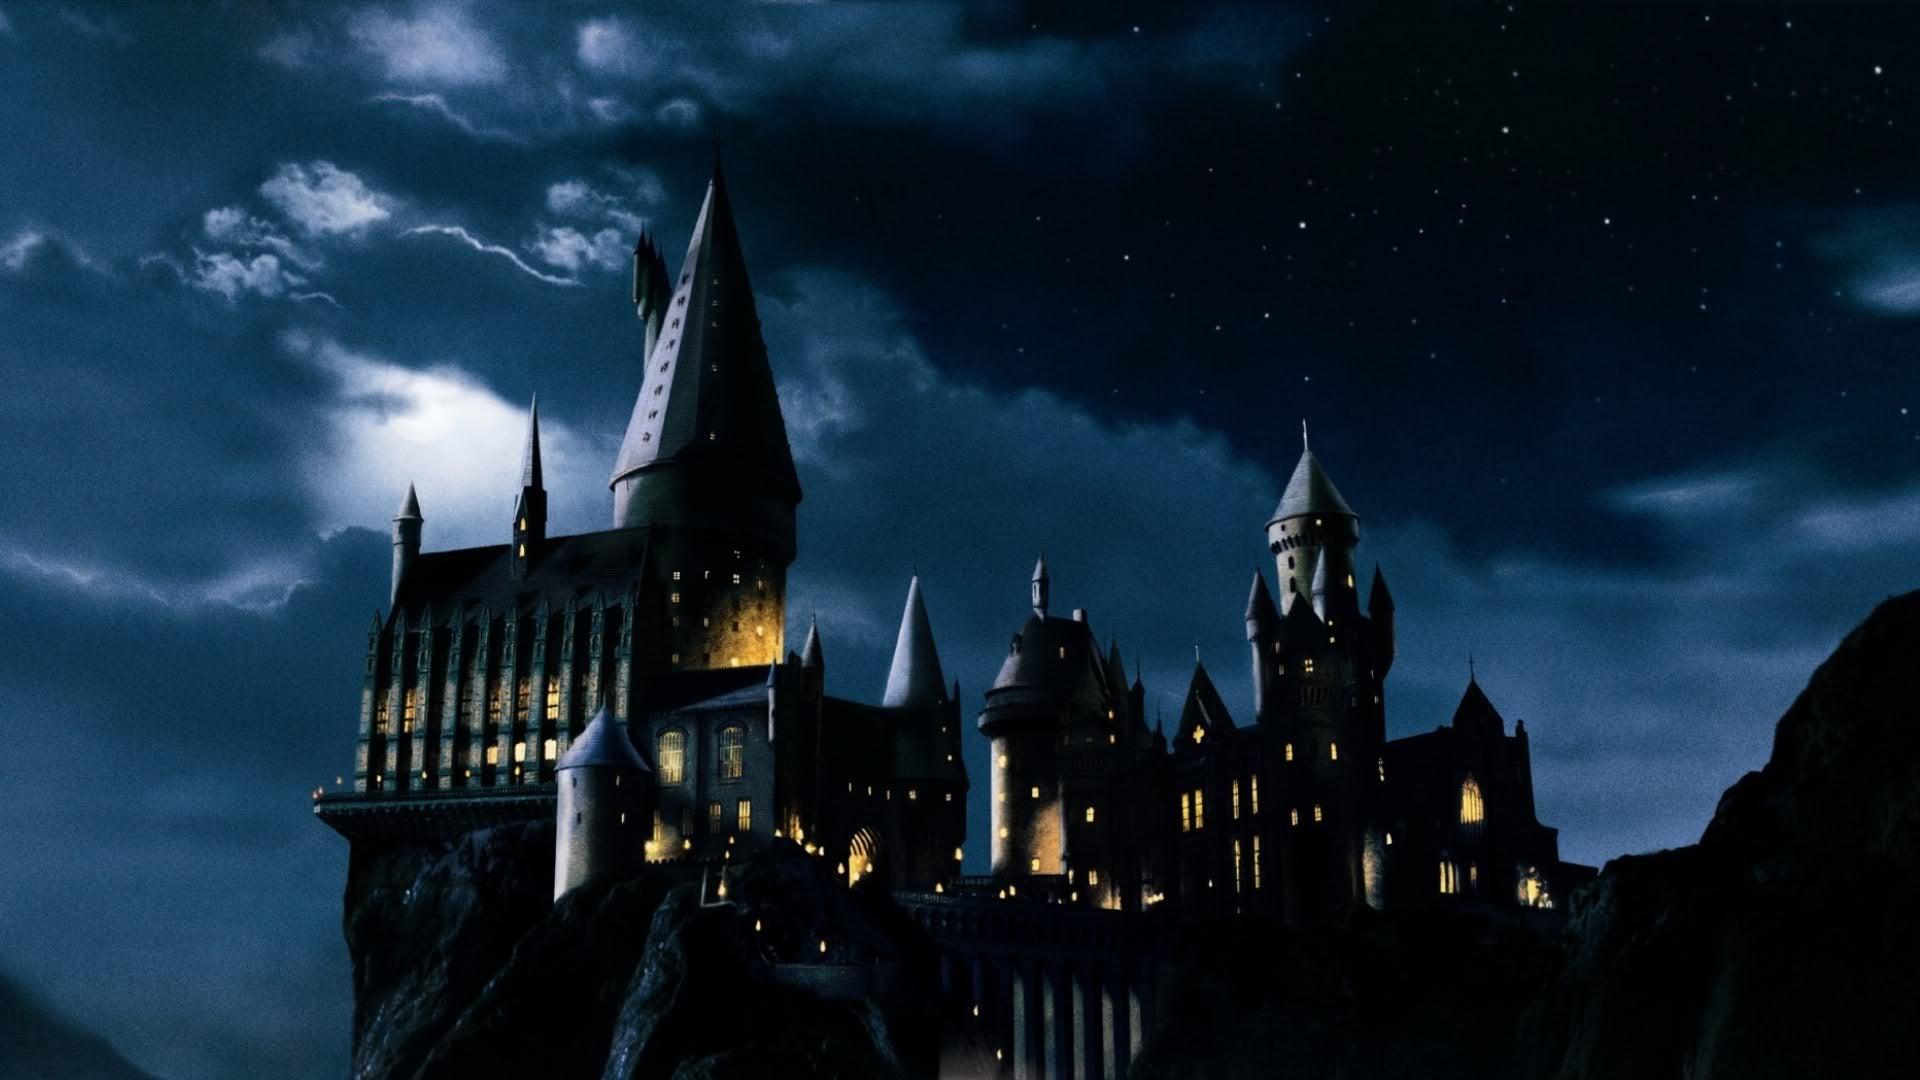 Fantastic Wallpaper Harry Potter Christmas - hogwarts-castle-harry-potter-166431-113432  Pictures_142279.jpg